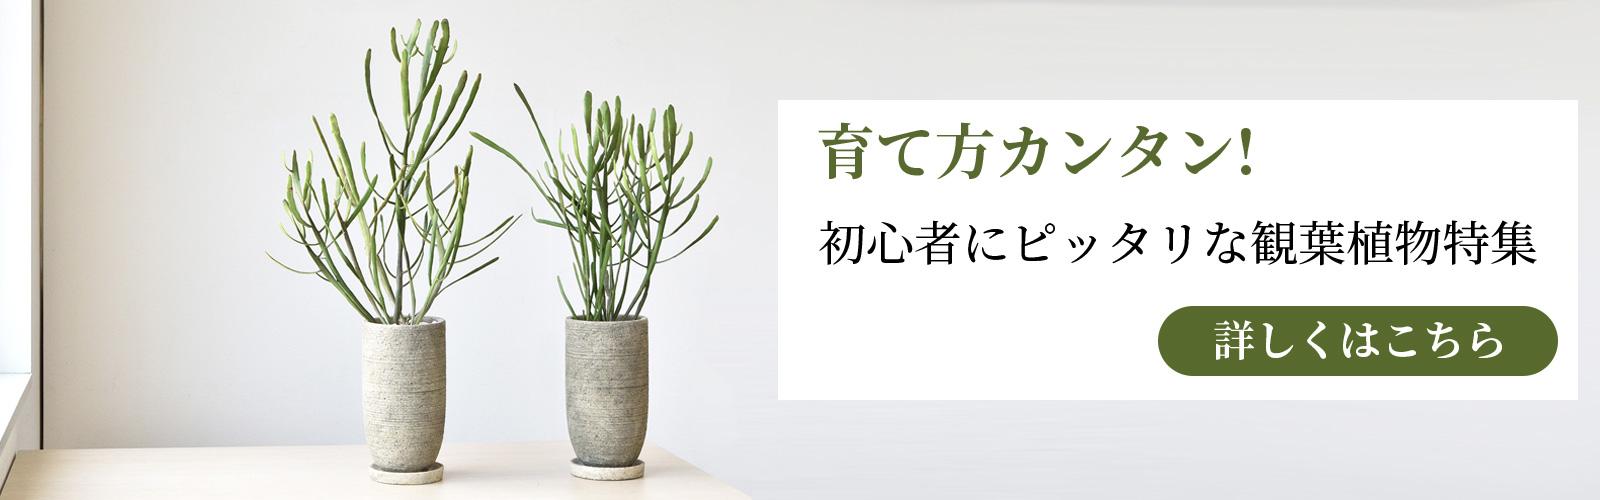 top_03_07.jpg